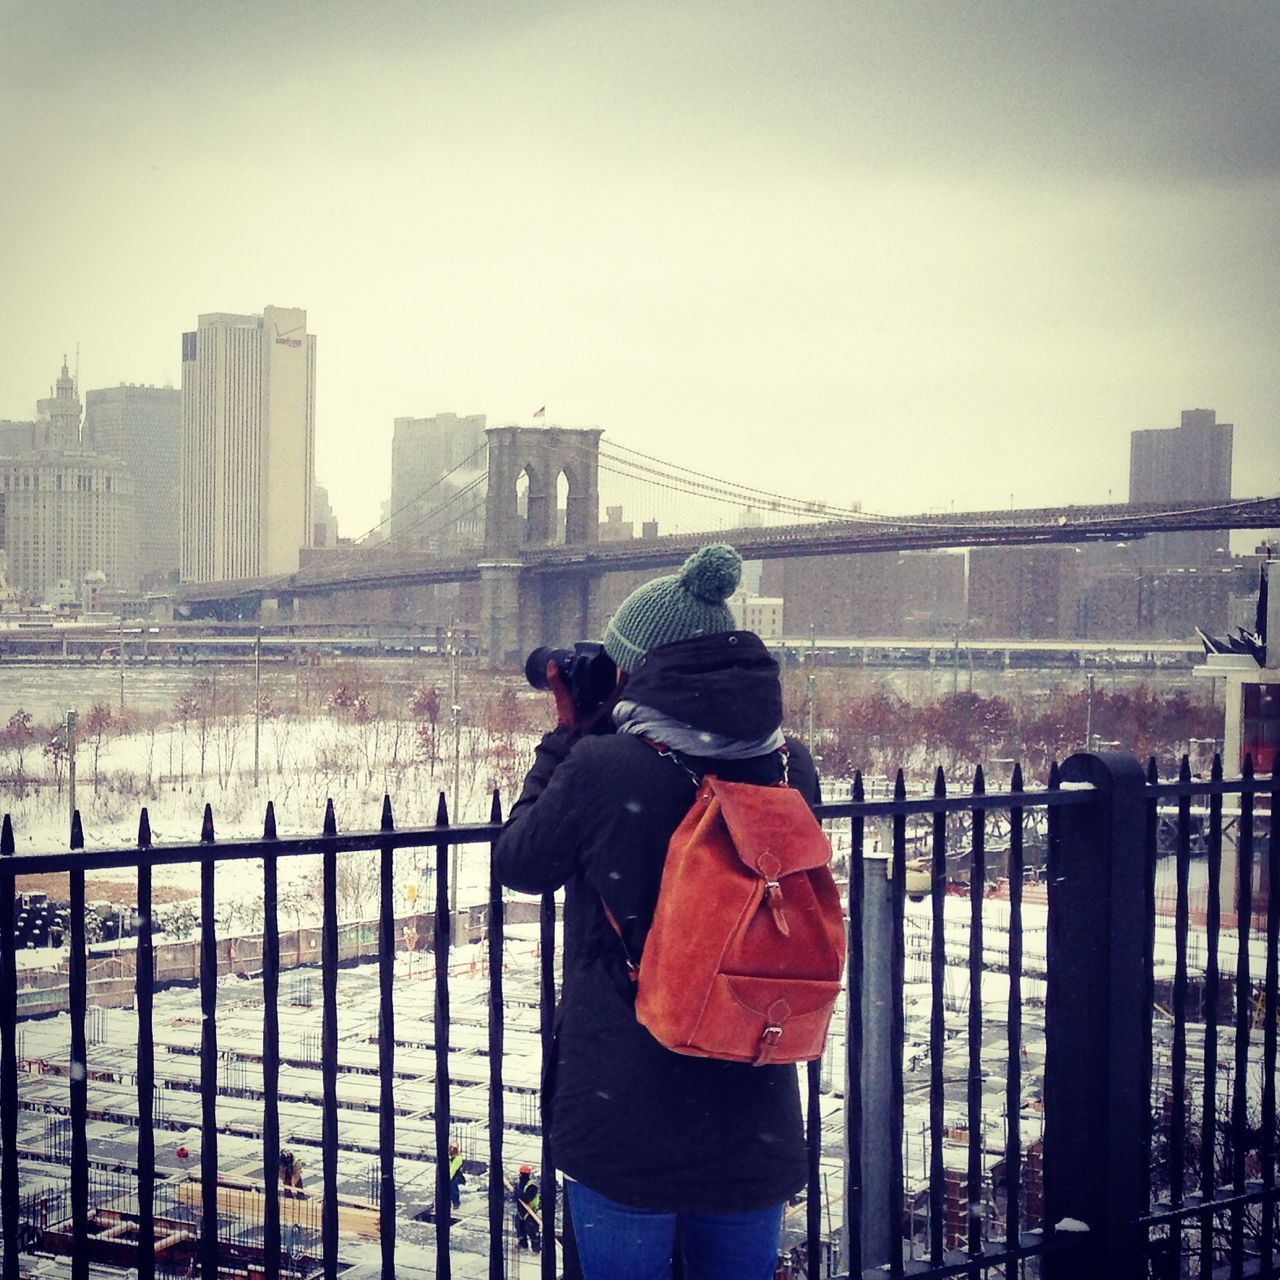 Bag Brooklyn Brooklyn Bridge / New York Foggy Grey New York New York City New York ❤ New York, New York Photographer Photography Photography In Motion Skyline Skyscraper Snow Taking Photos Taking Pictures Travel Travel Destinations Traveling Winter